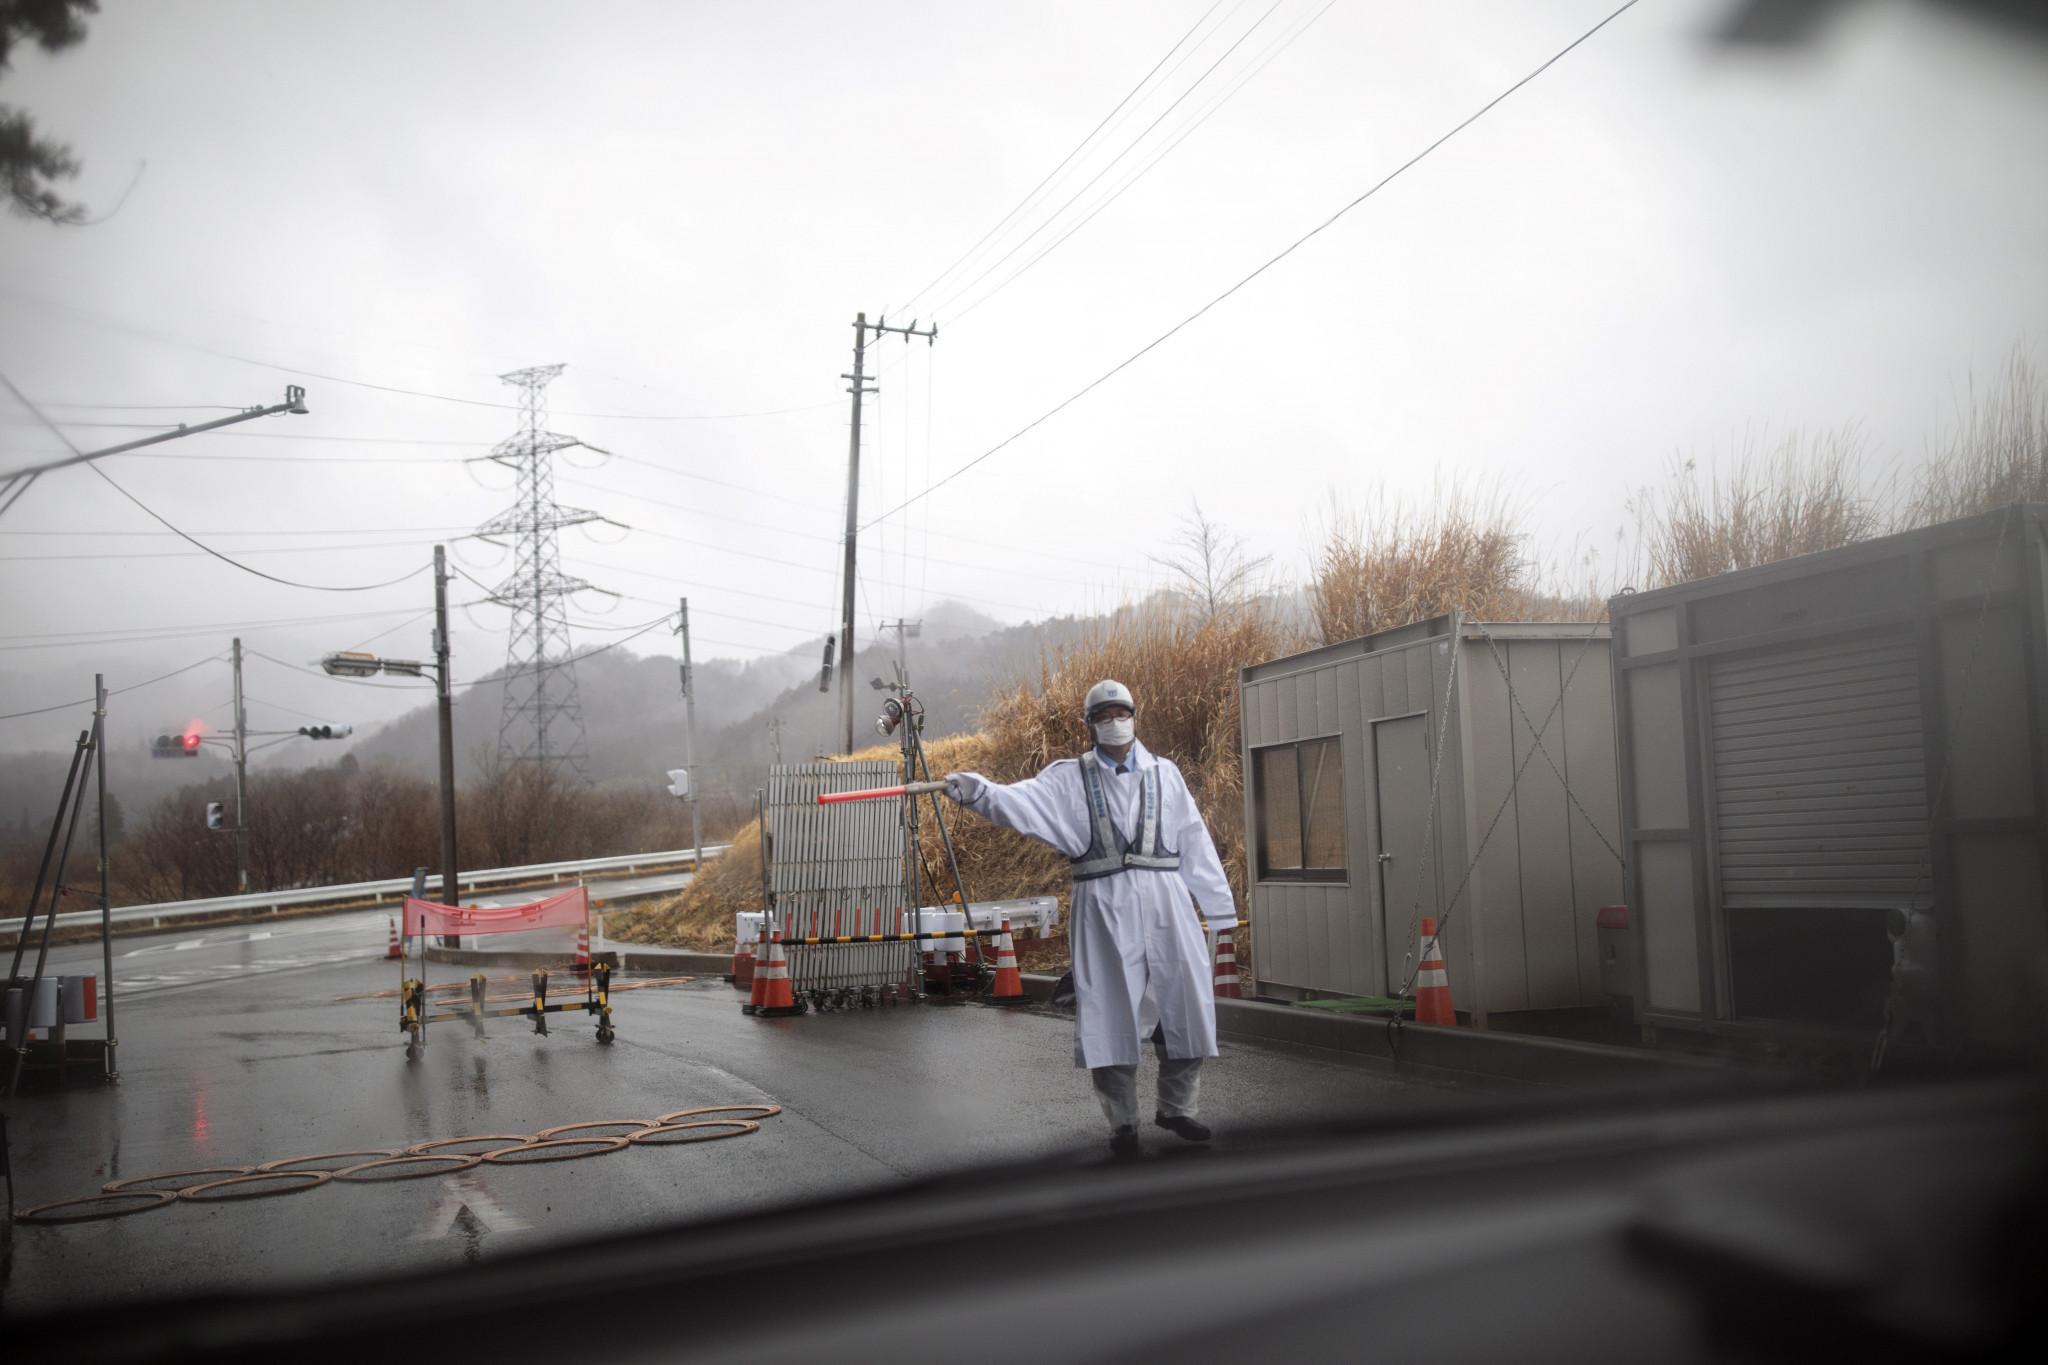 Tokyo 2020 Torch Relay to visit town near Fukushima declared no-go zone